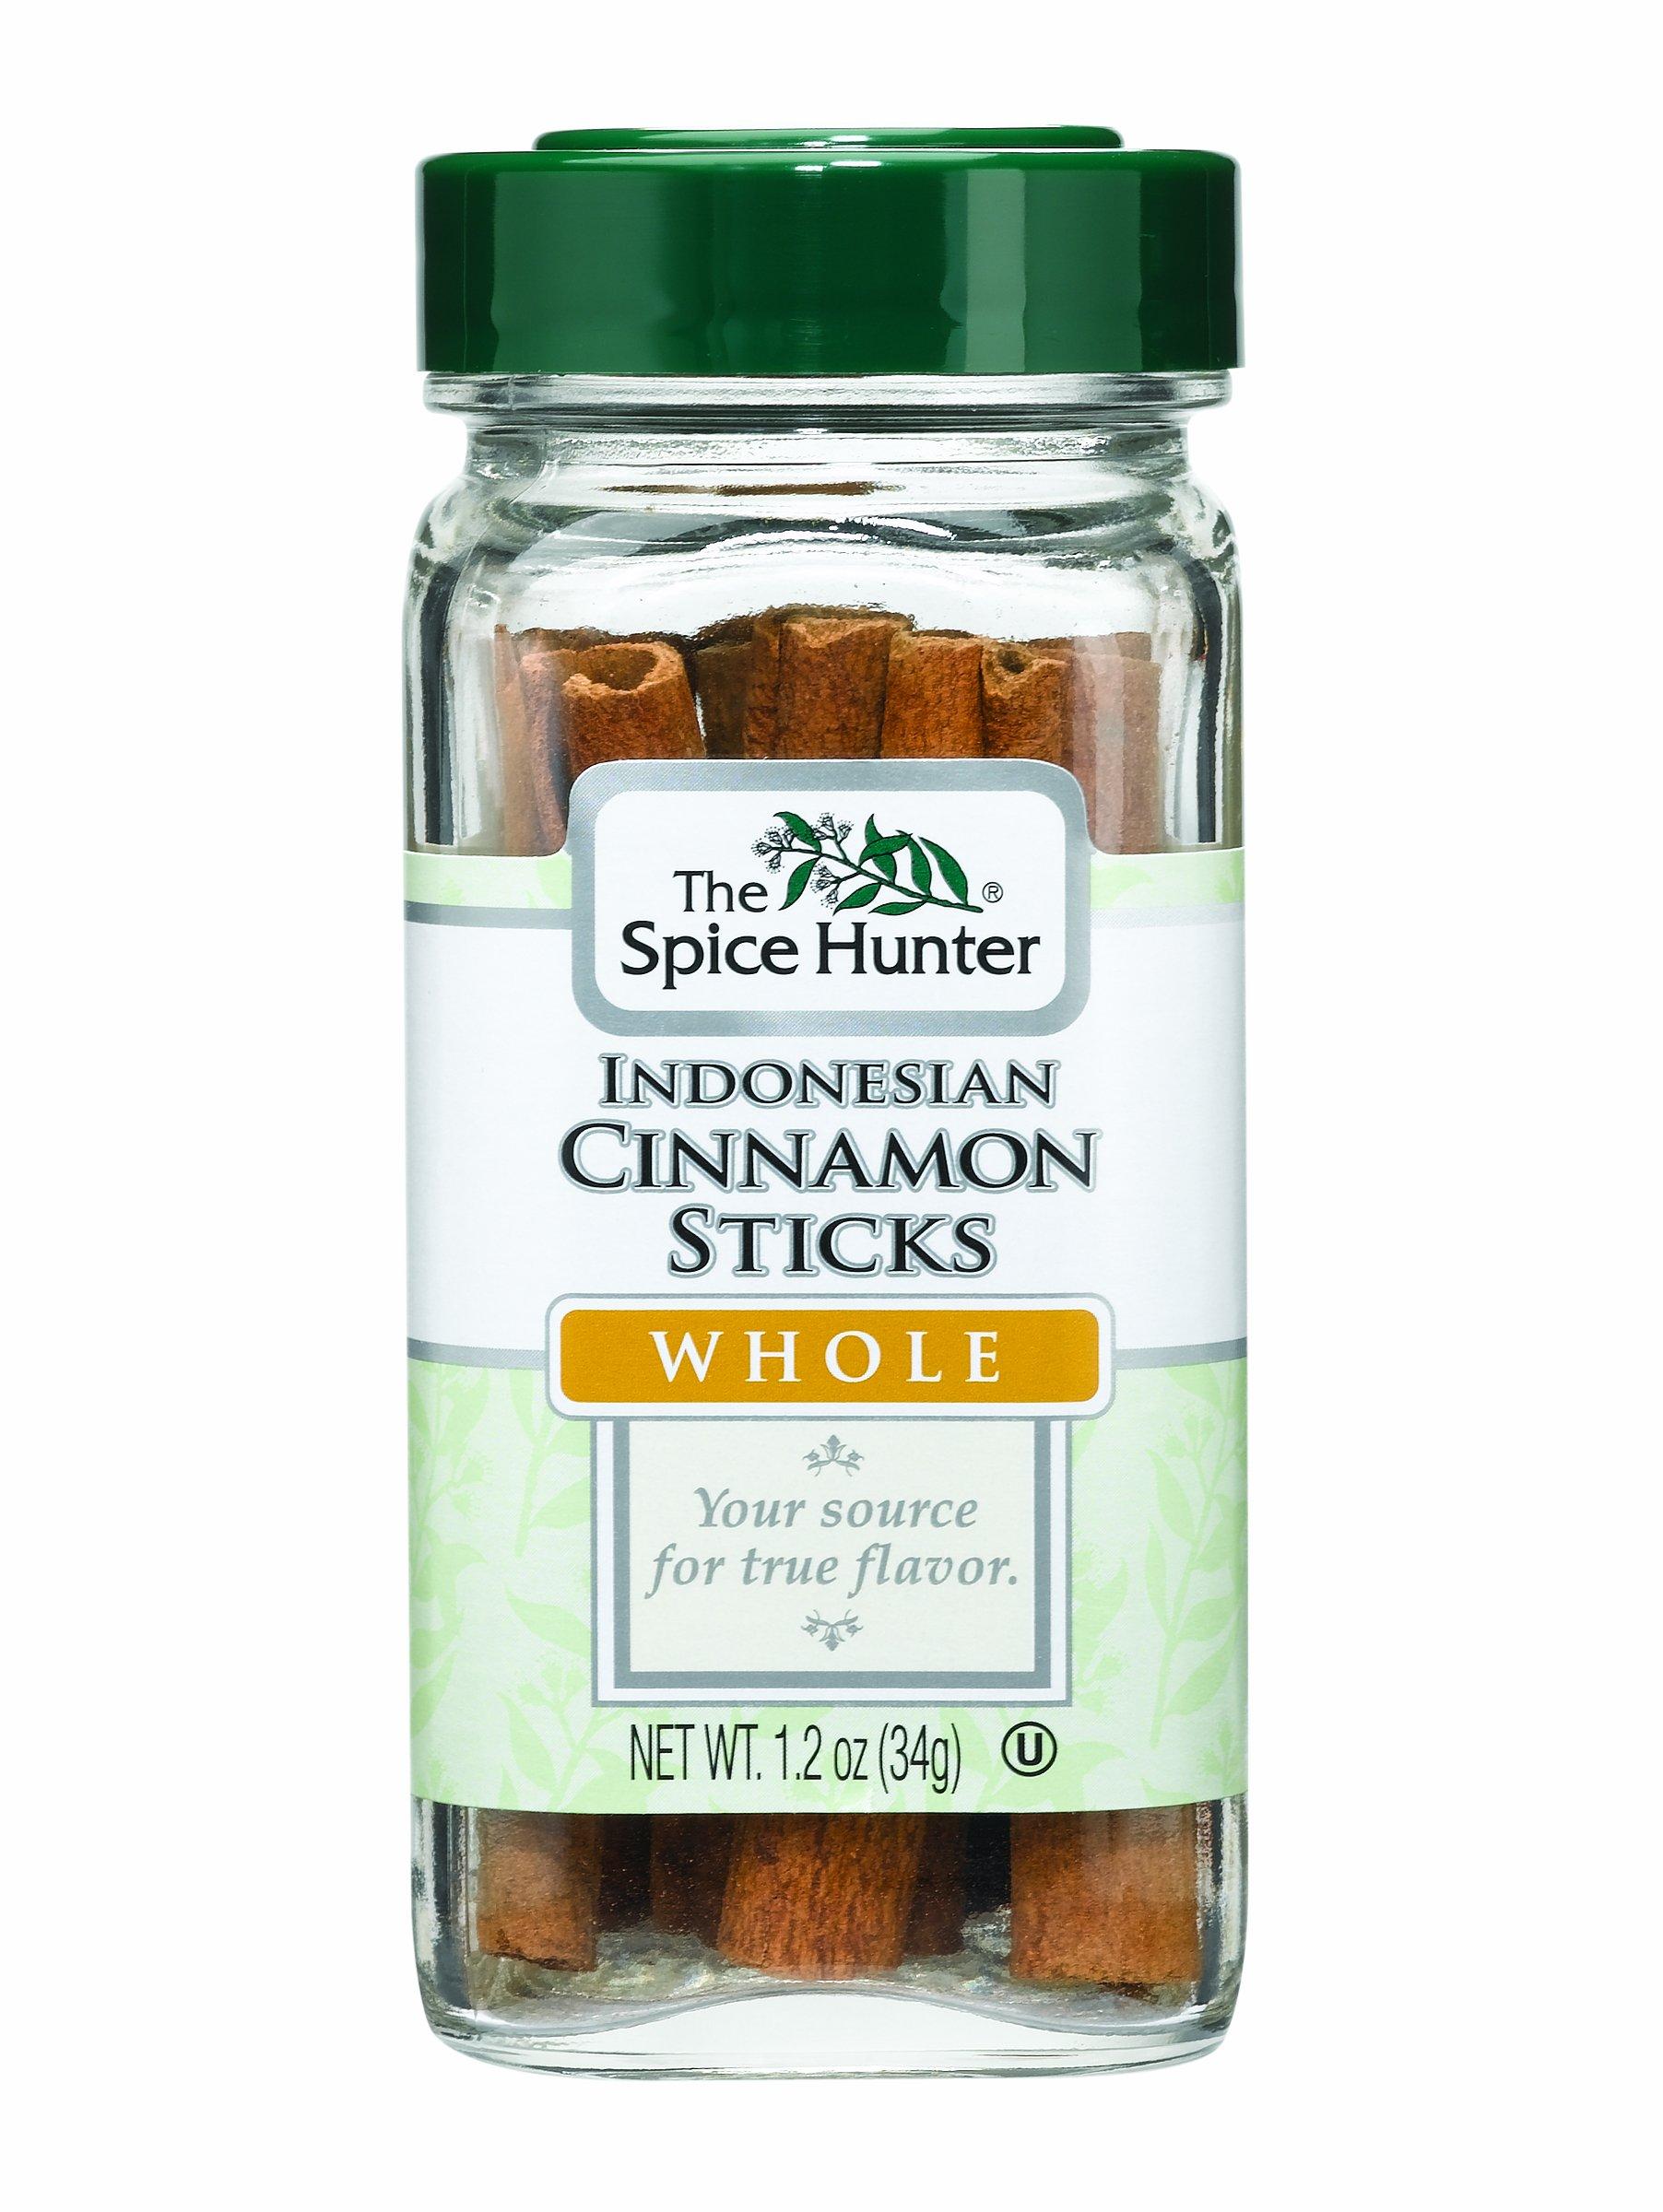 The Spice Hunter Indonesian Cinnamon Sticks, Whole, 1.2-Ounce Jar